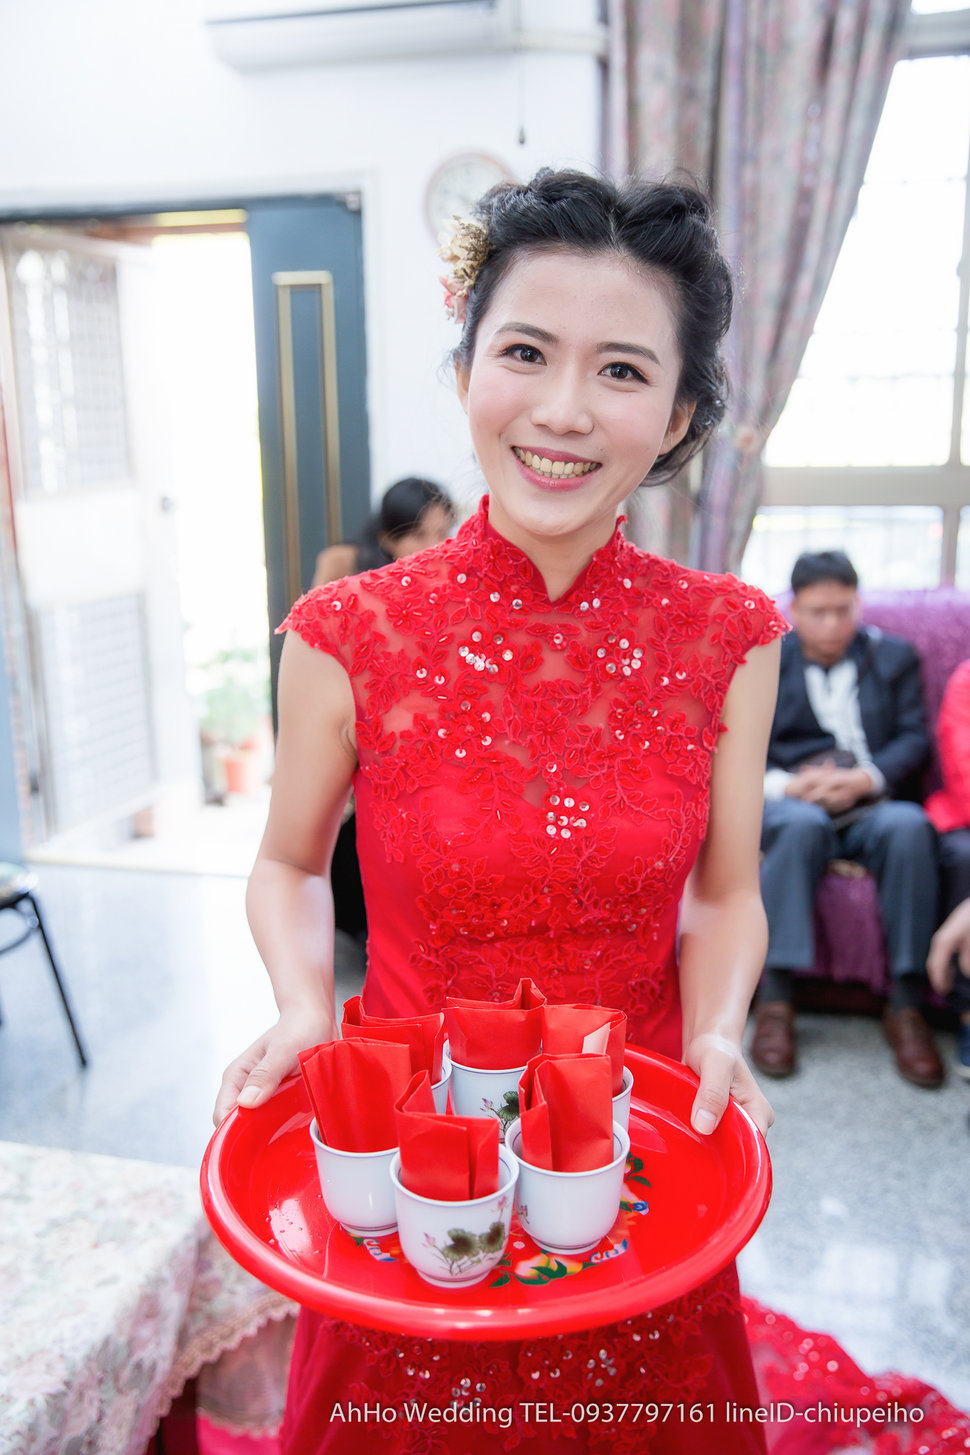 AhHo Wedding TEL-0937797161 lineID-chiupeiho (38 - 163) - AhHoWedding/阿河婚攝《結婚吧》